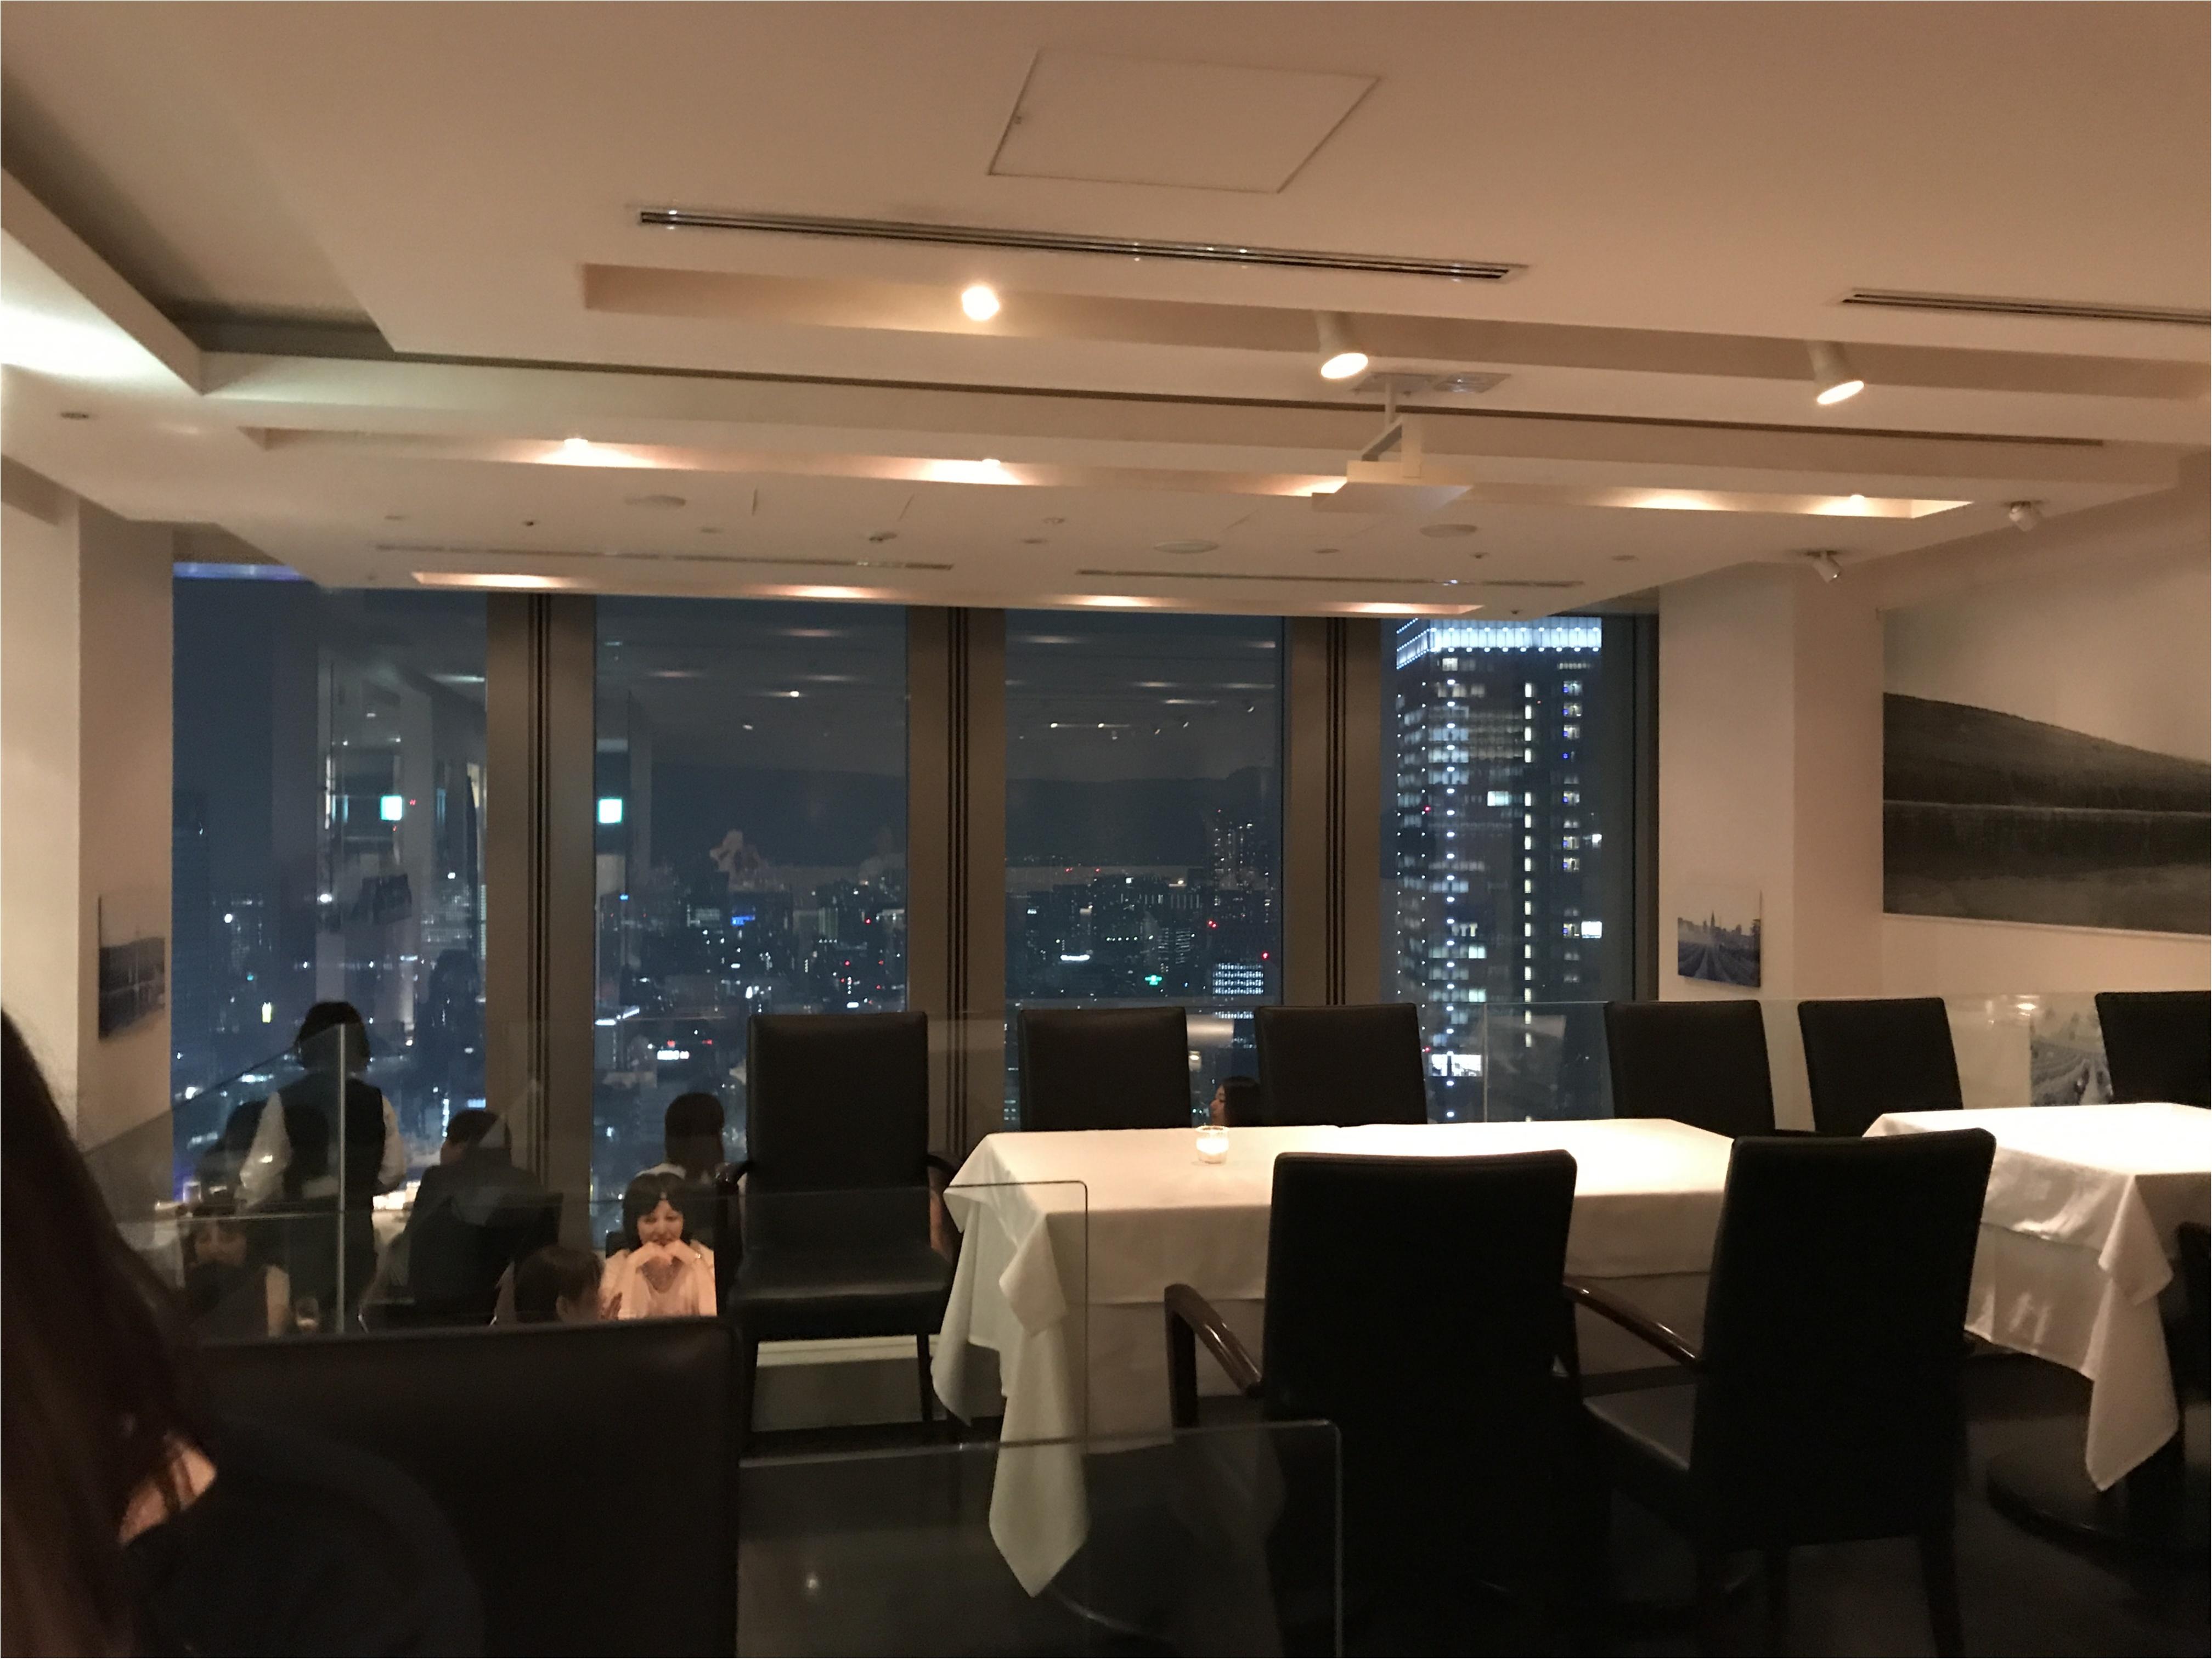 【AUXAMIS TOKYO】東京駅丸ビル35階絶景のフレンチレストランで誕生日ディナー♡_2